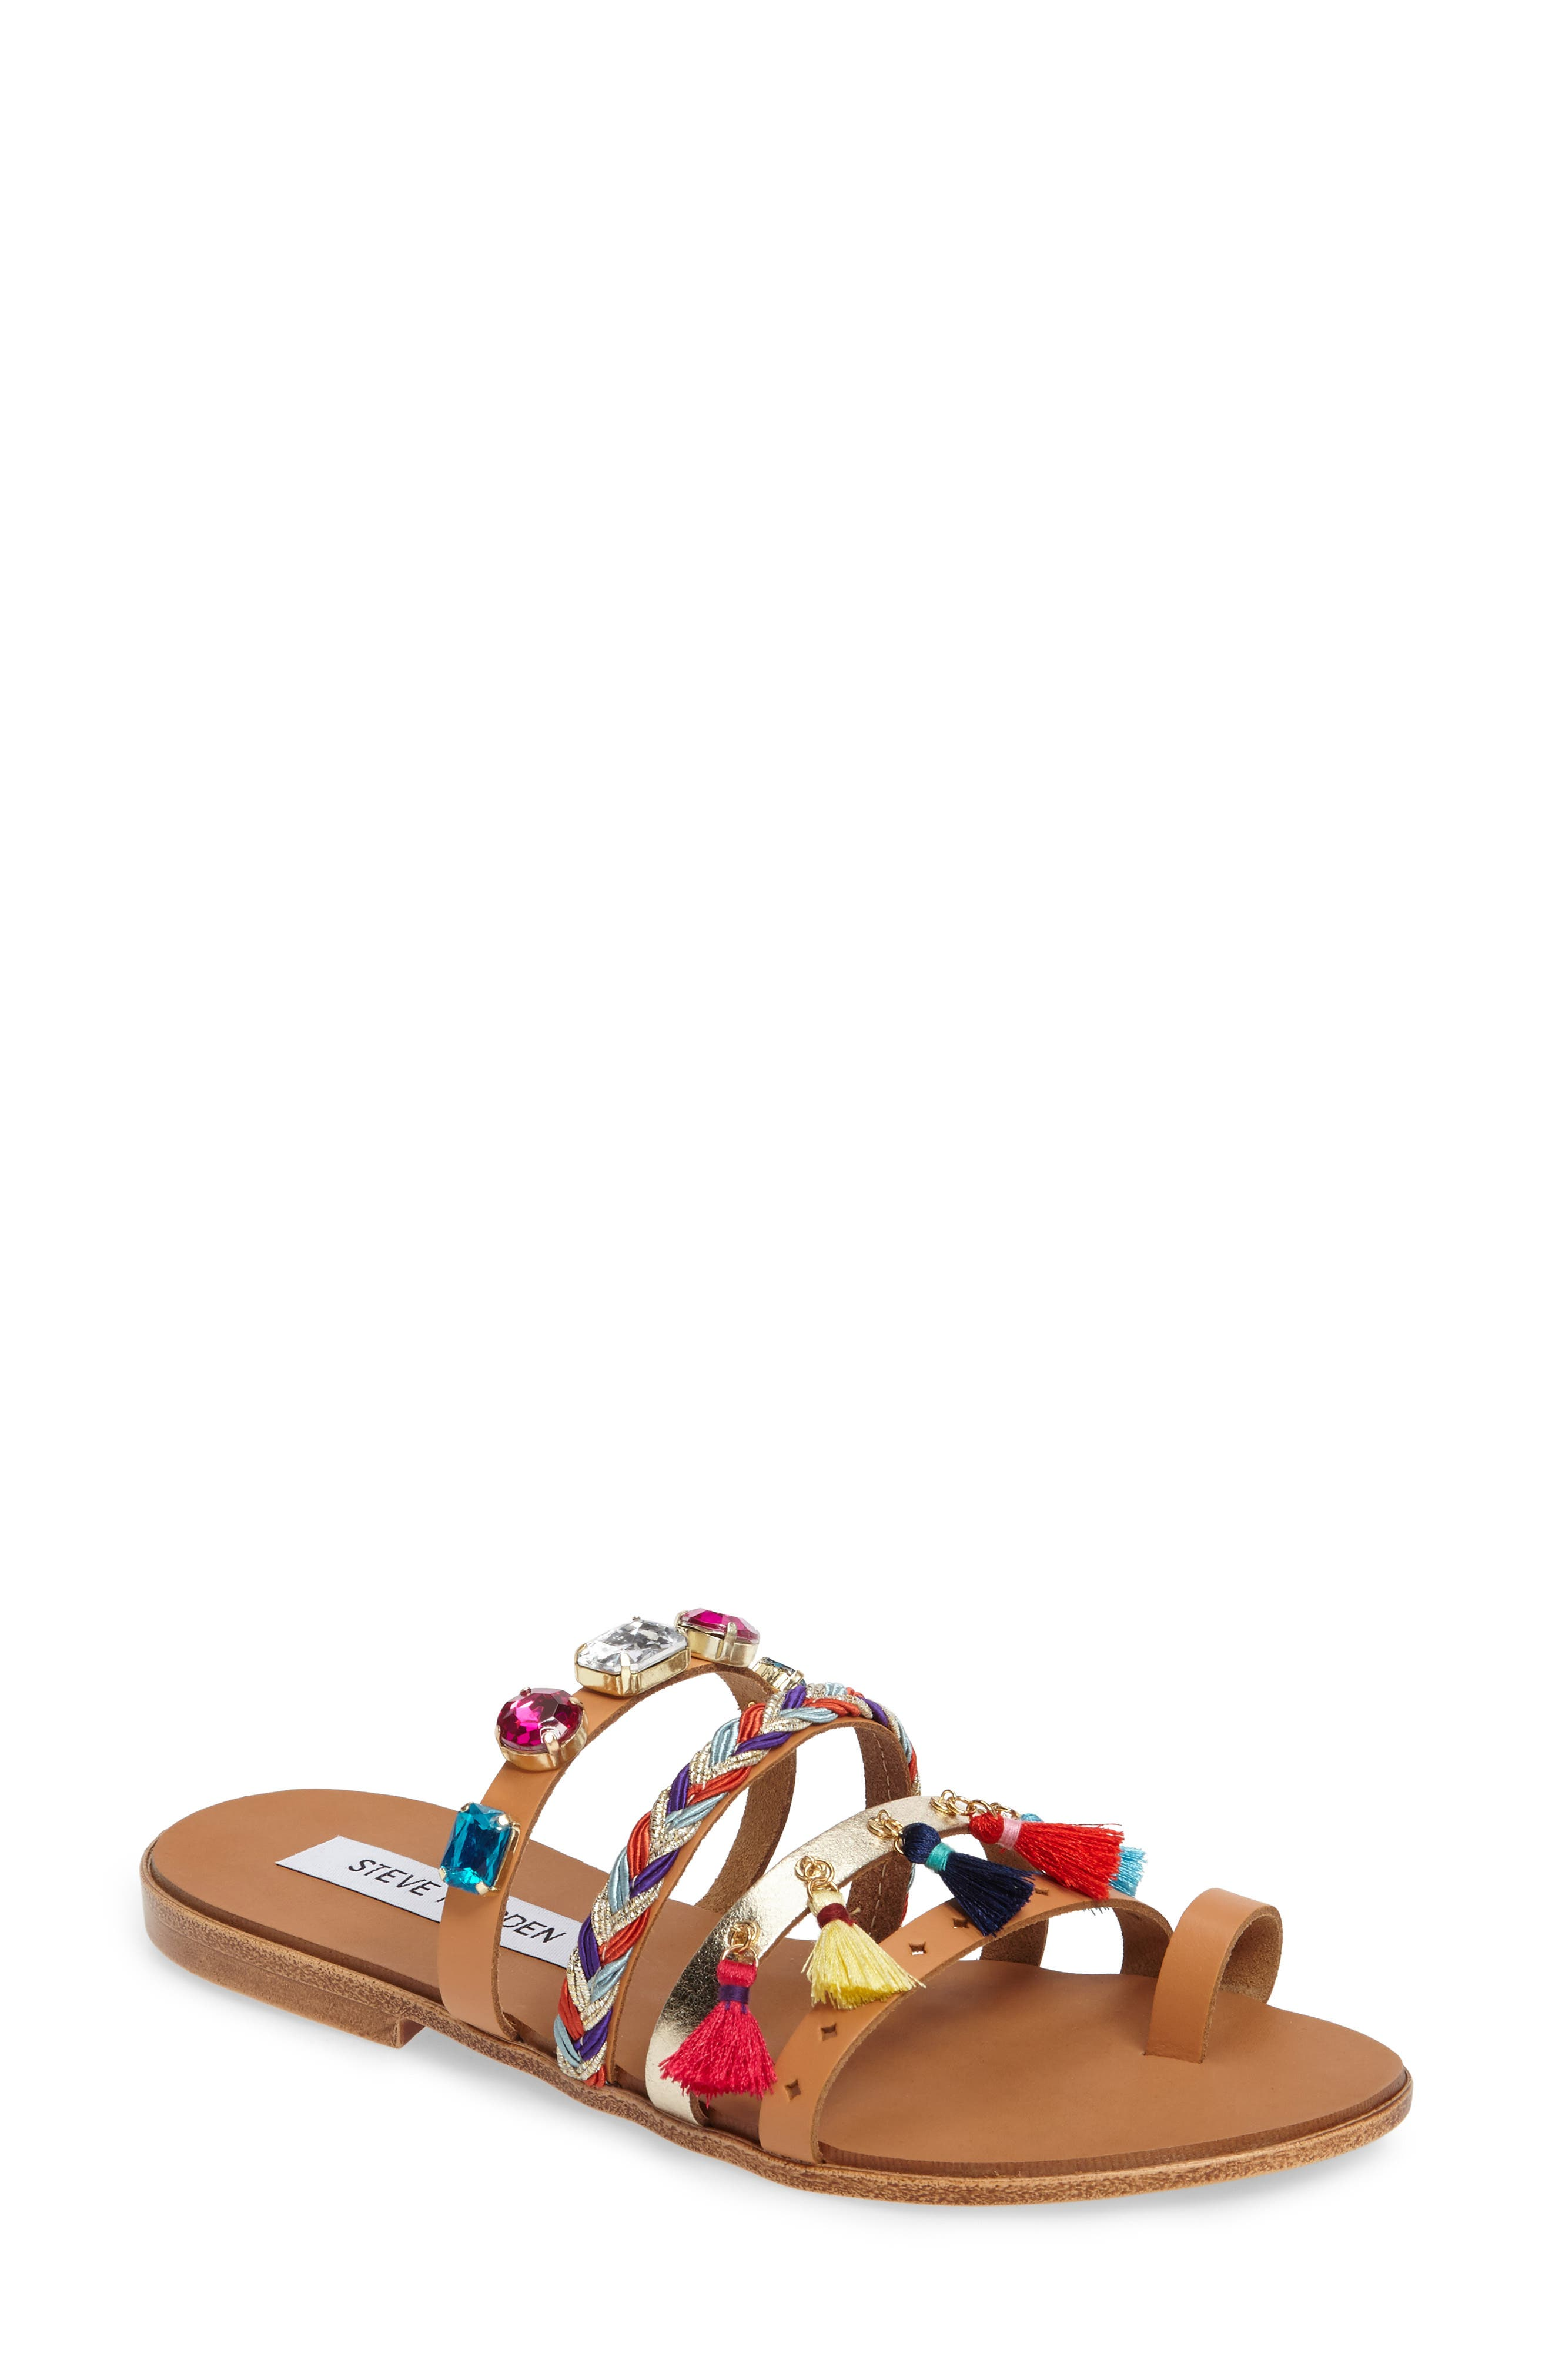 Cary Embellished Sandal,                         Main,                         color, 200